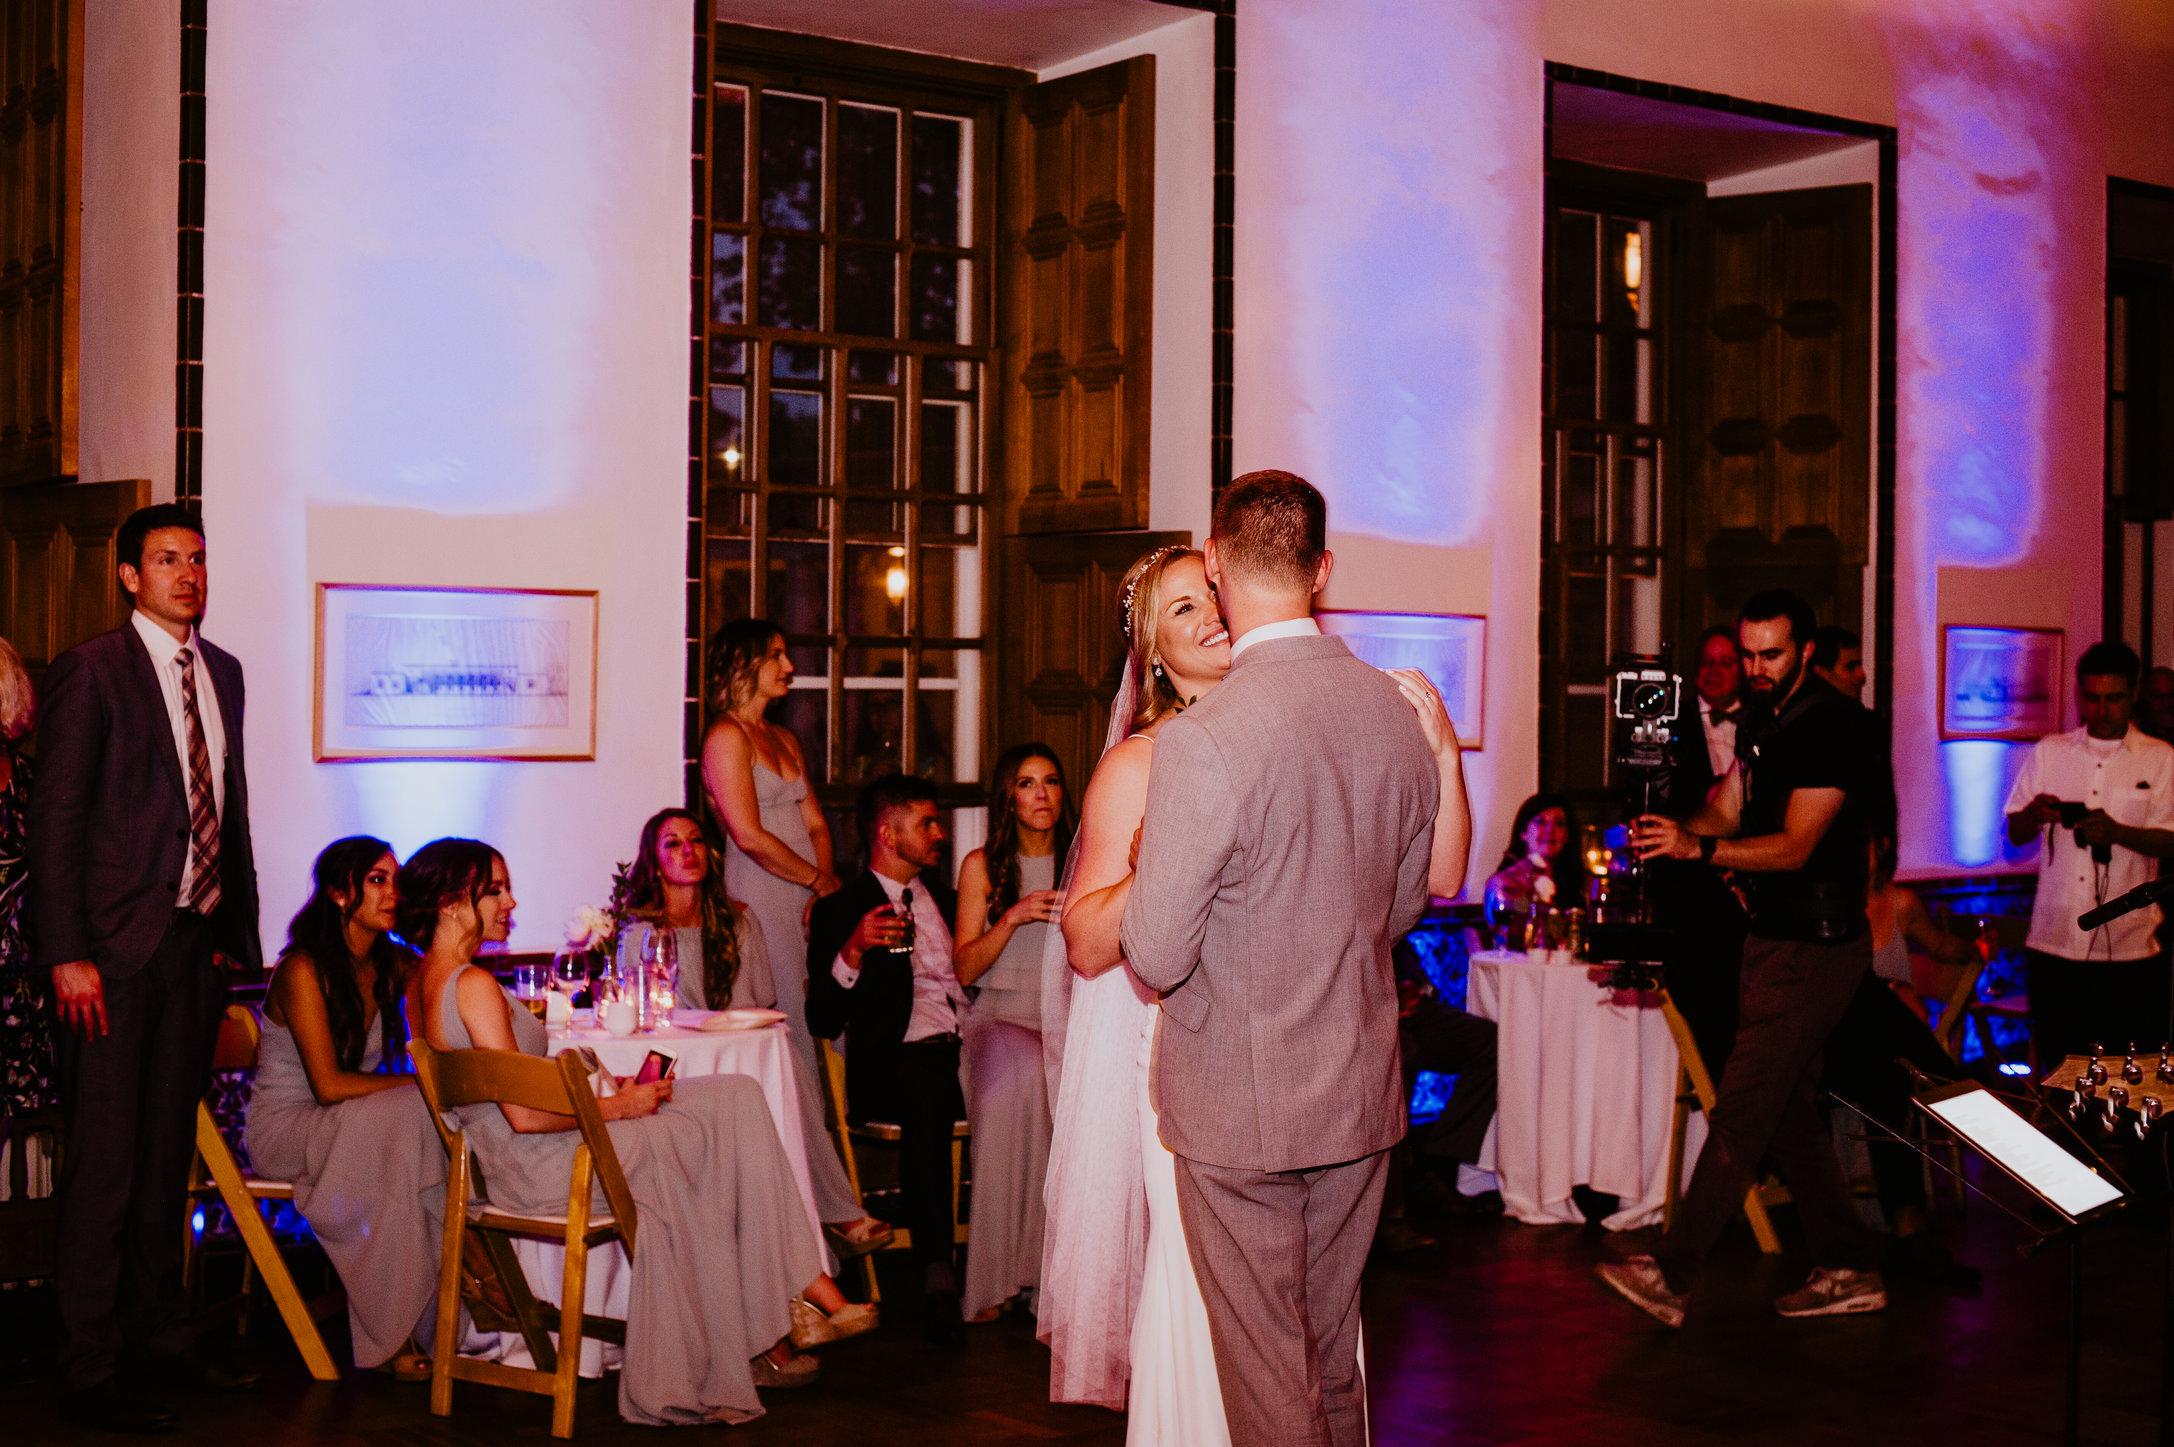 DandA-wedding-803.jpg